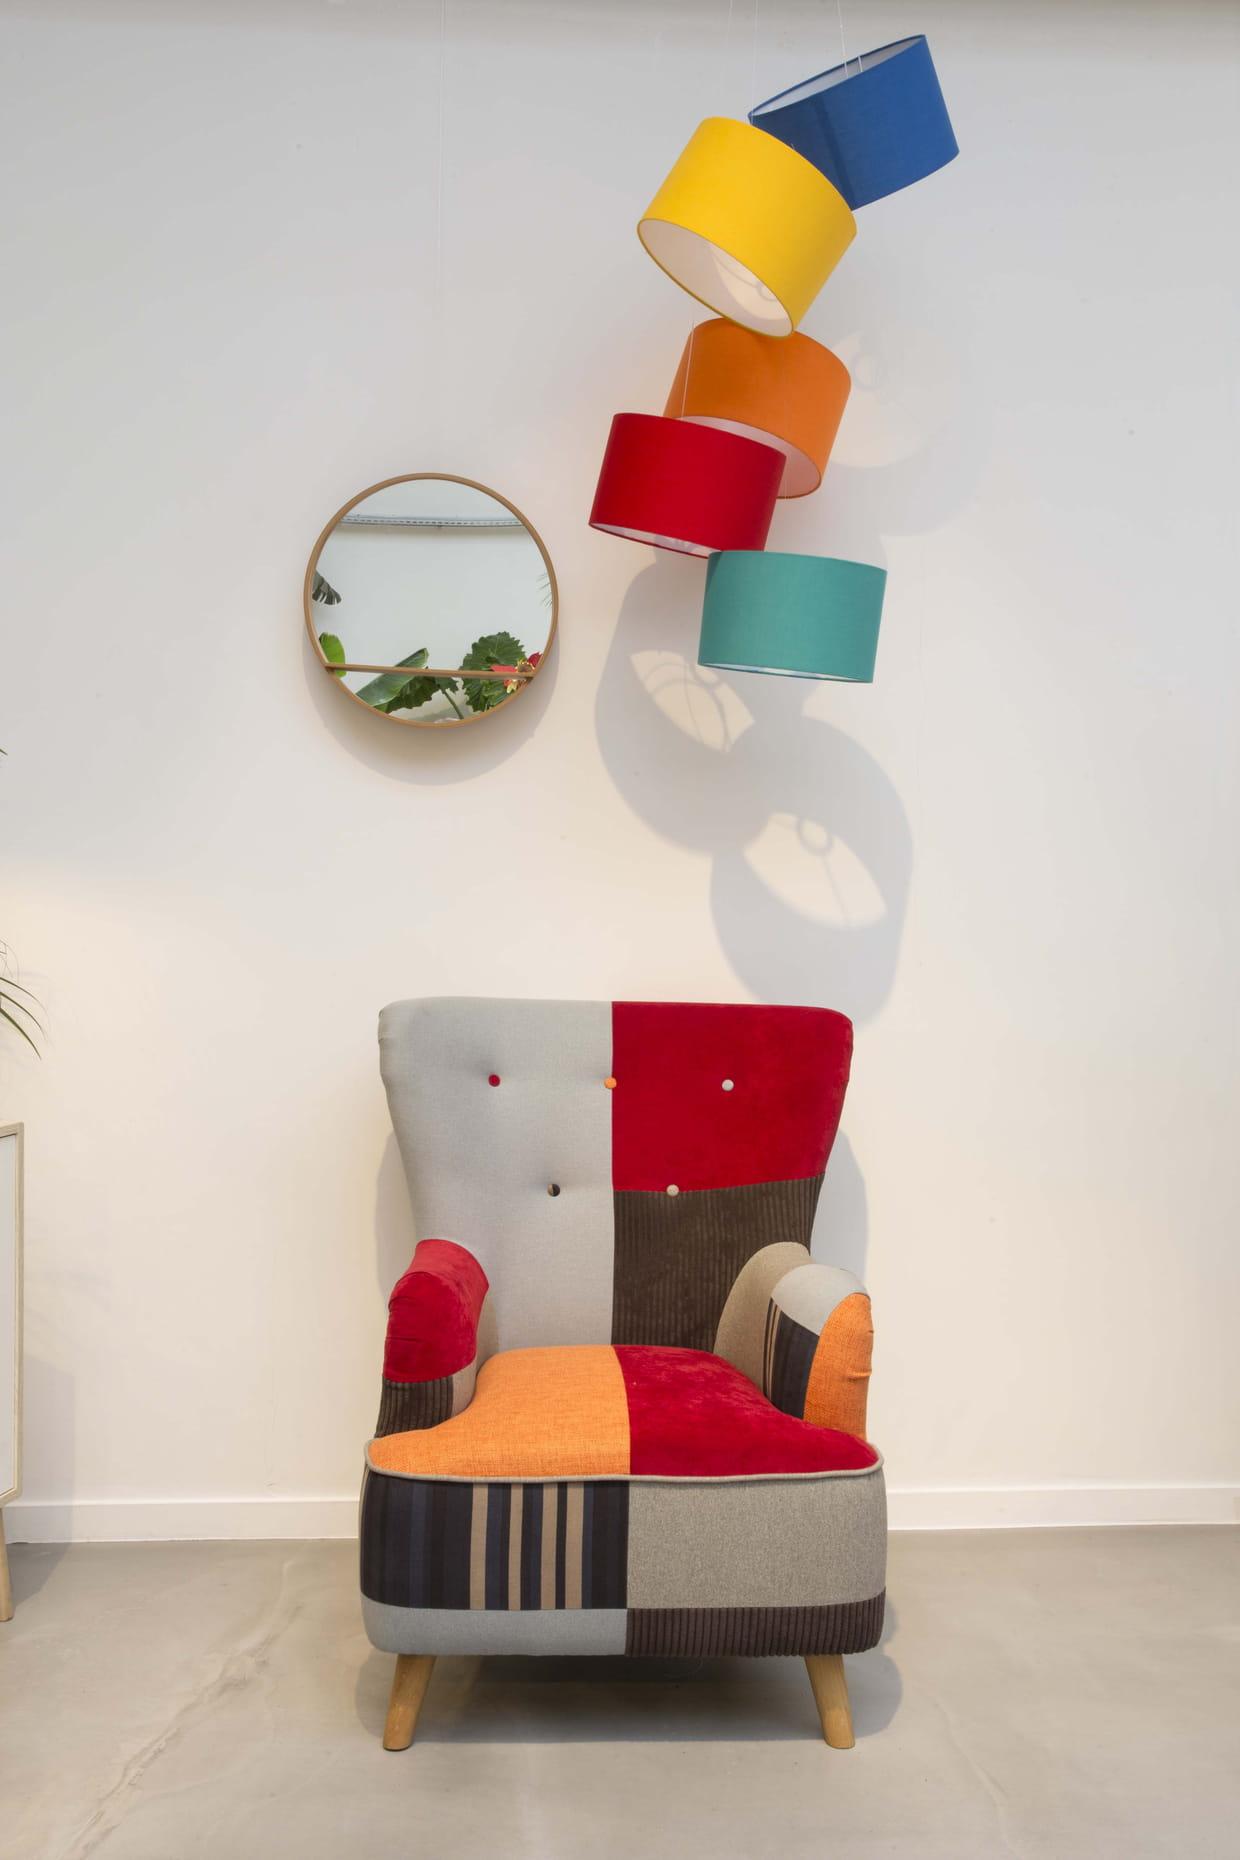 Fauteuil arlequin chez conforama - Petit fauteuil conforama ...